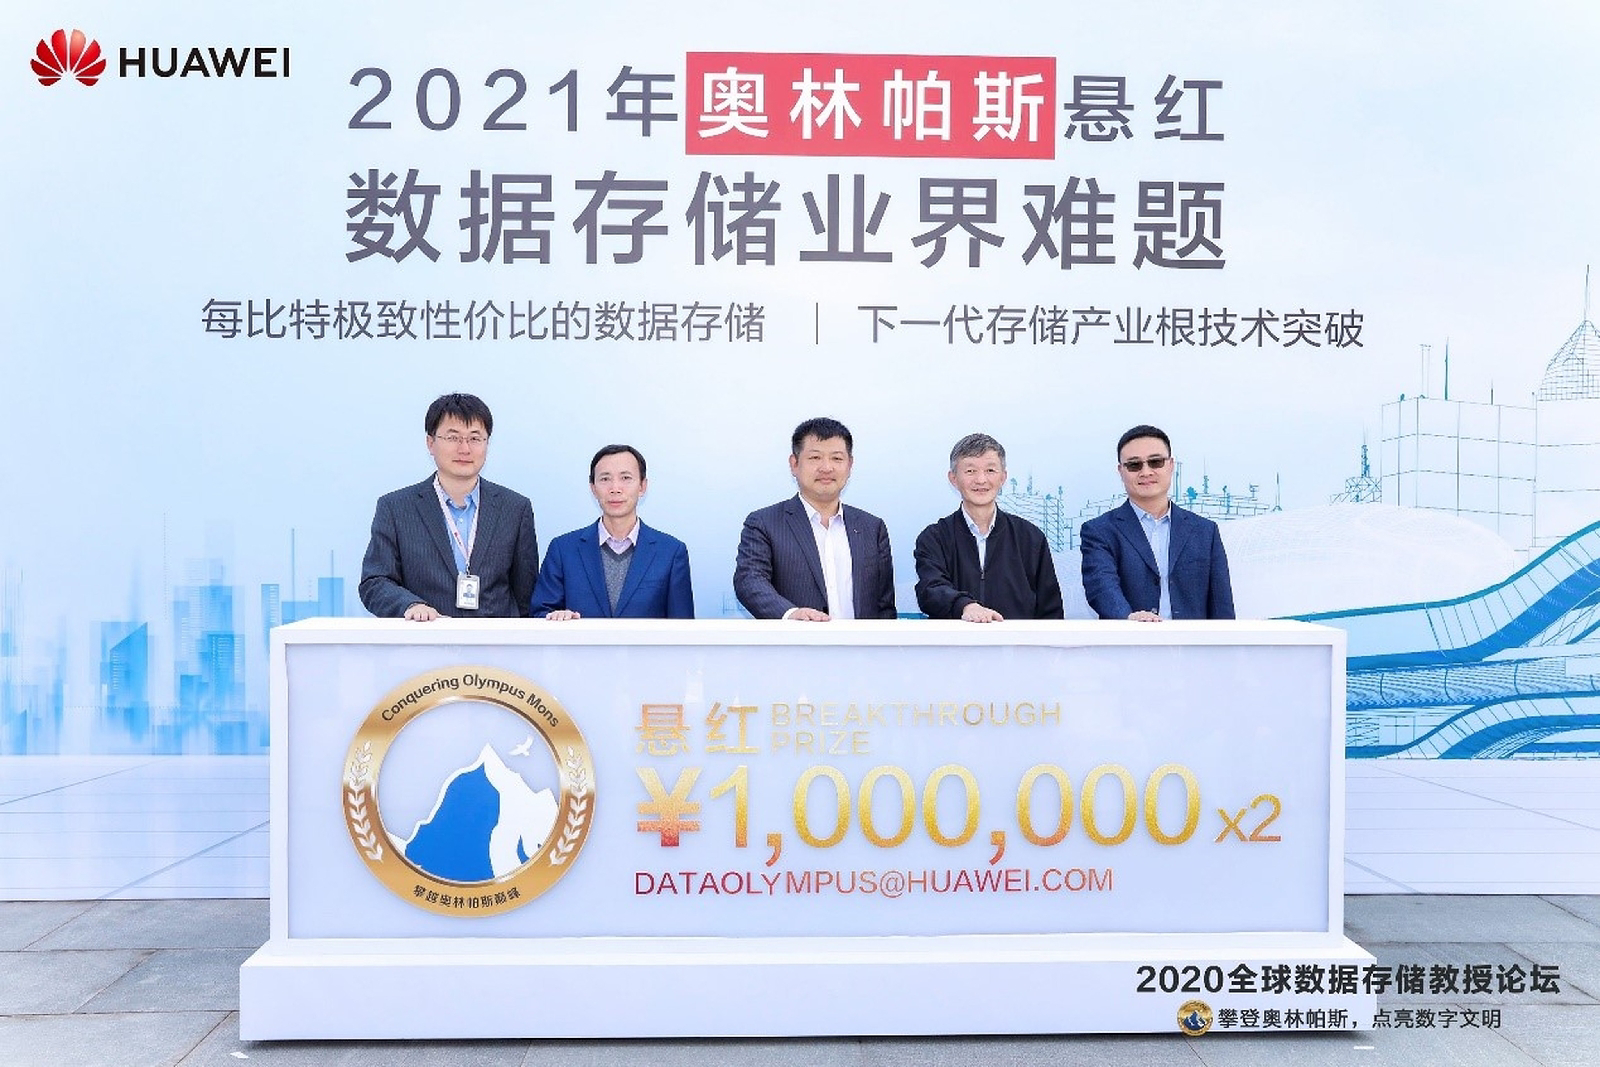 Huawei รวมพลังนักวิจัยนานาชาติลุยแก้ปัญหาด้านการจัดเก็บข้อมูลในอุตสาหกรรมโลก